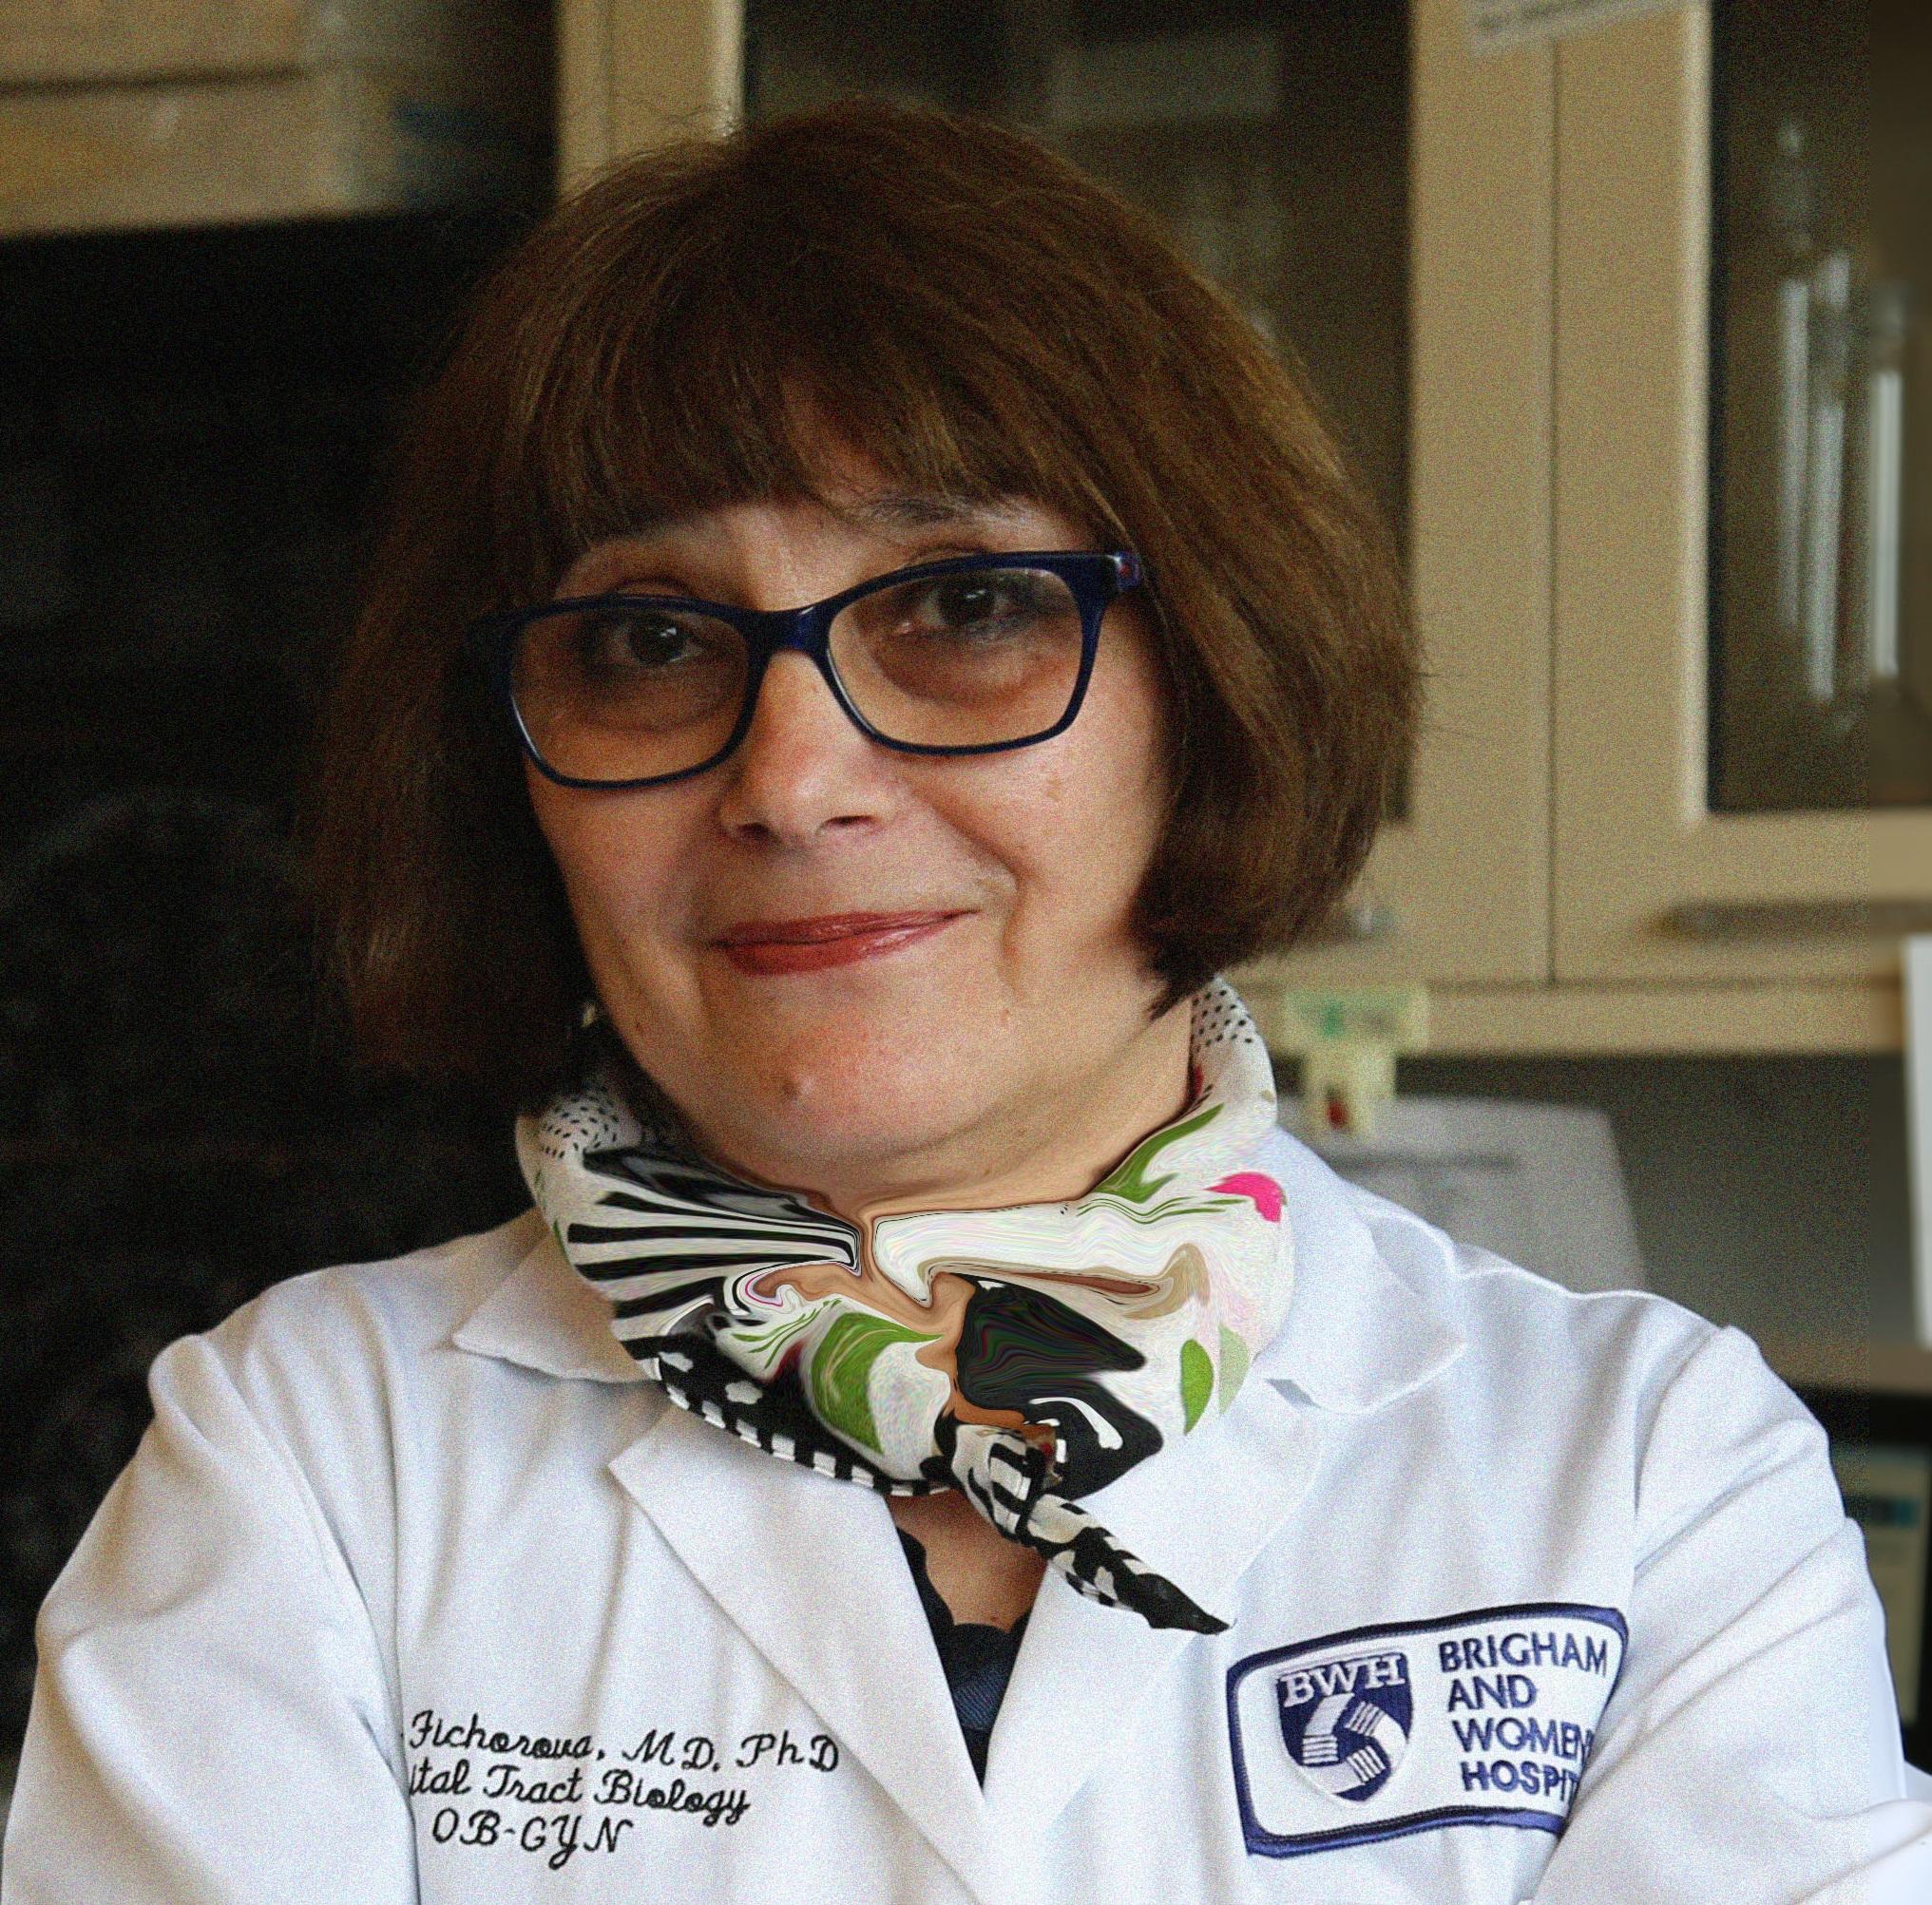 Raina Fichorova, MD, PhD: Innovative Reproductive Immunologist Envisioning A Healthier Generation